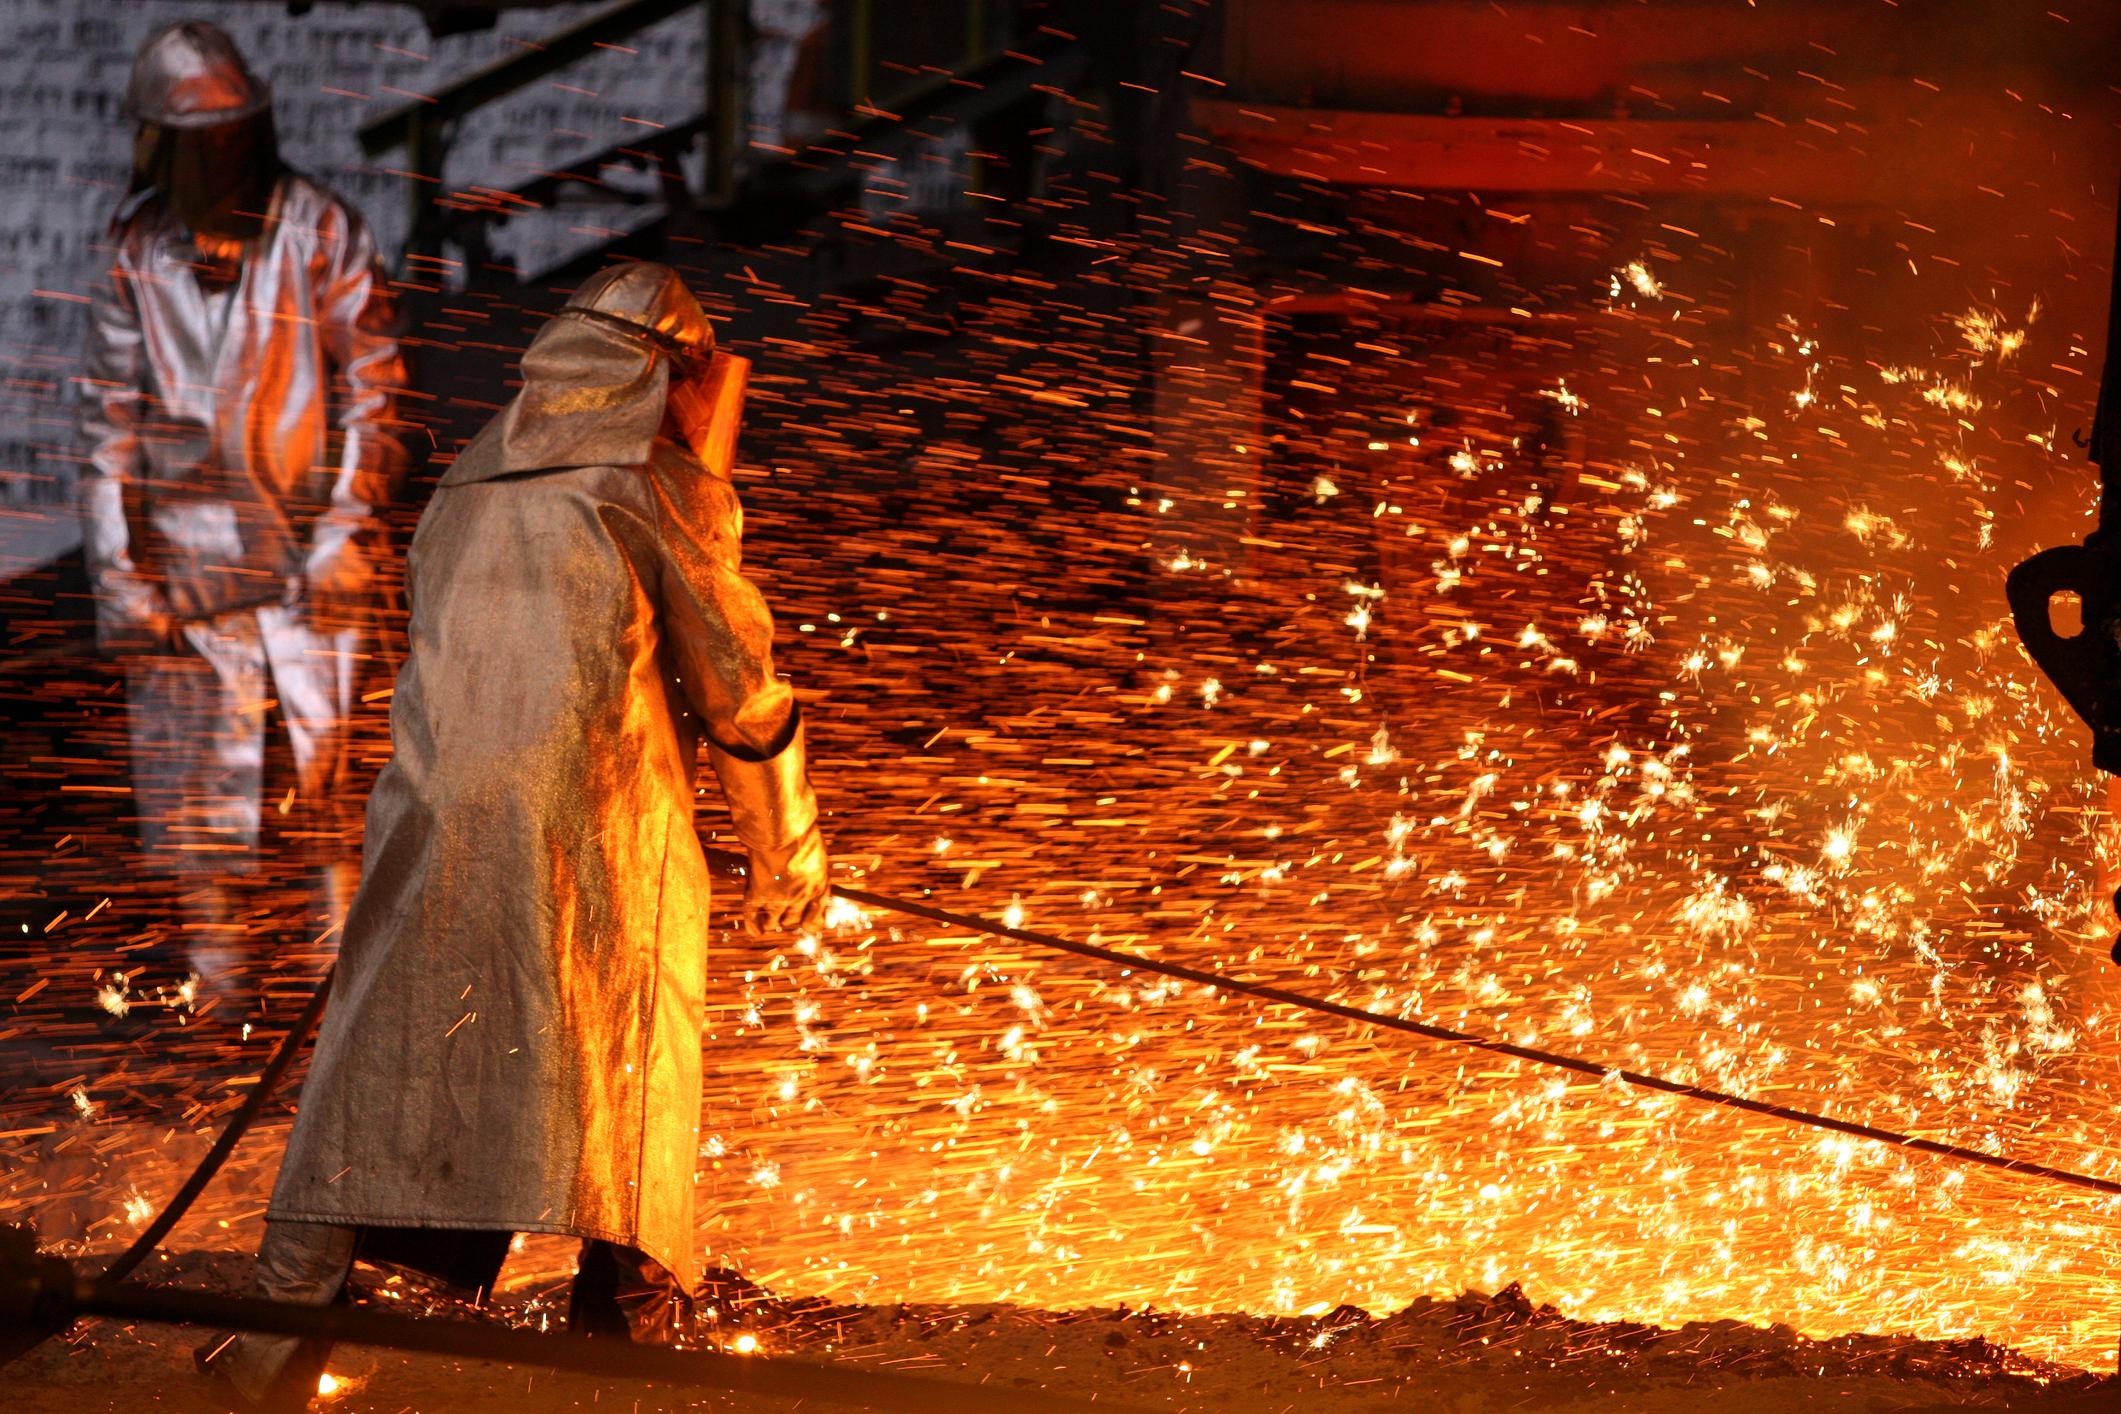 Steel making blast furnace